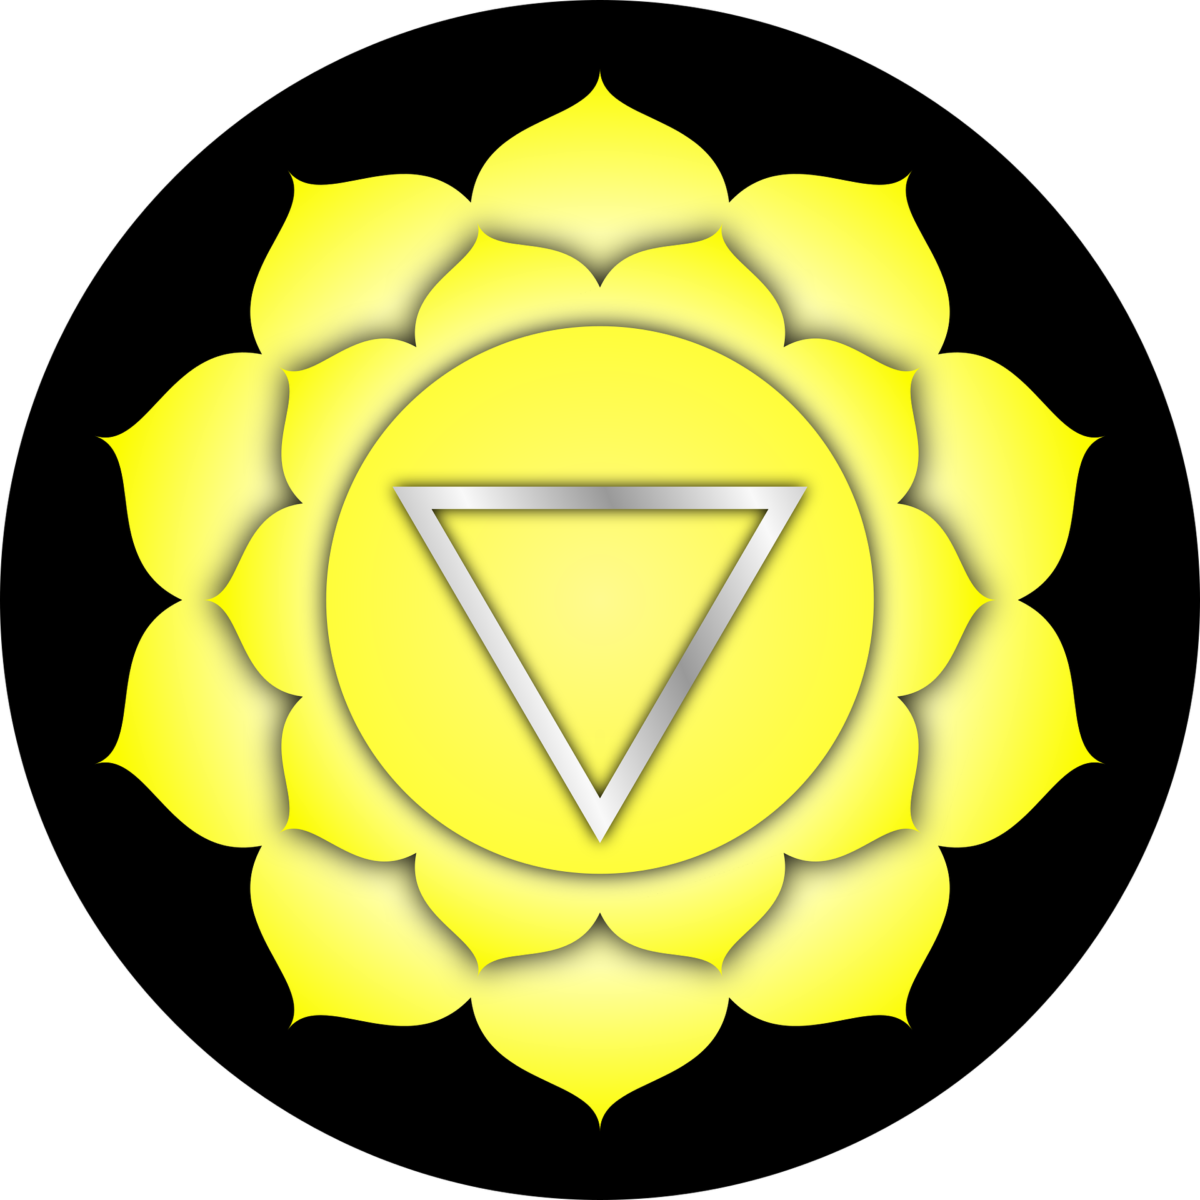 3. Chakra, das Solarplexuschakra